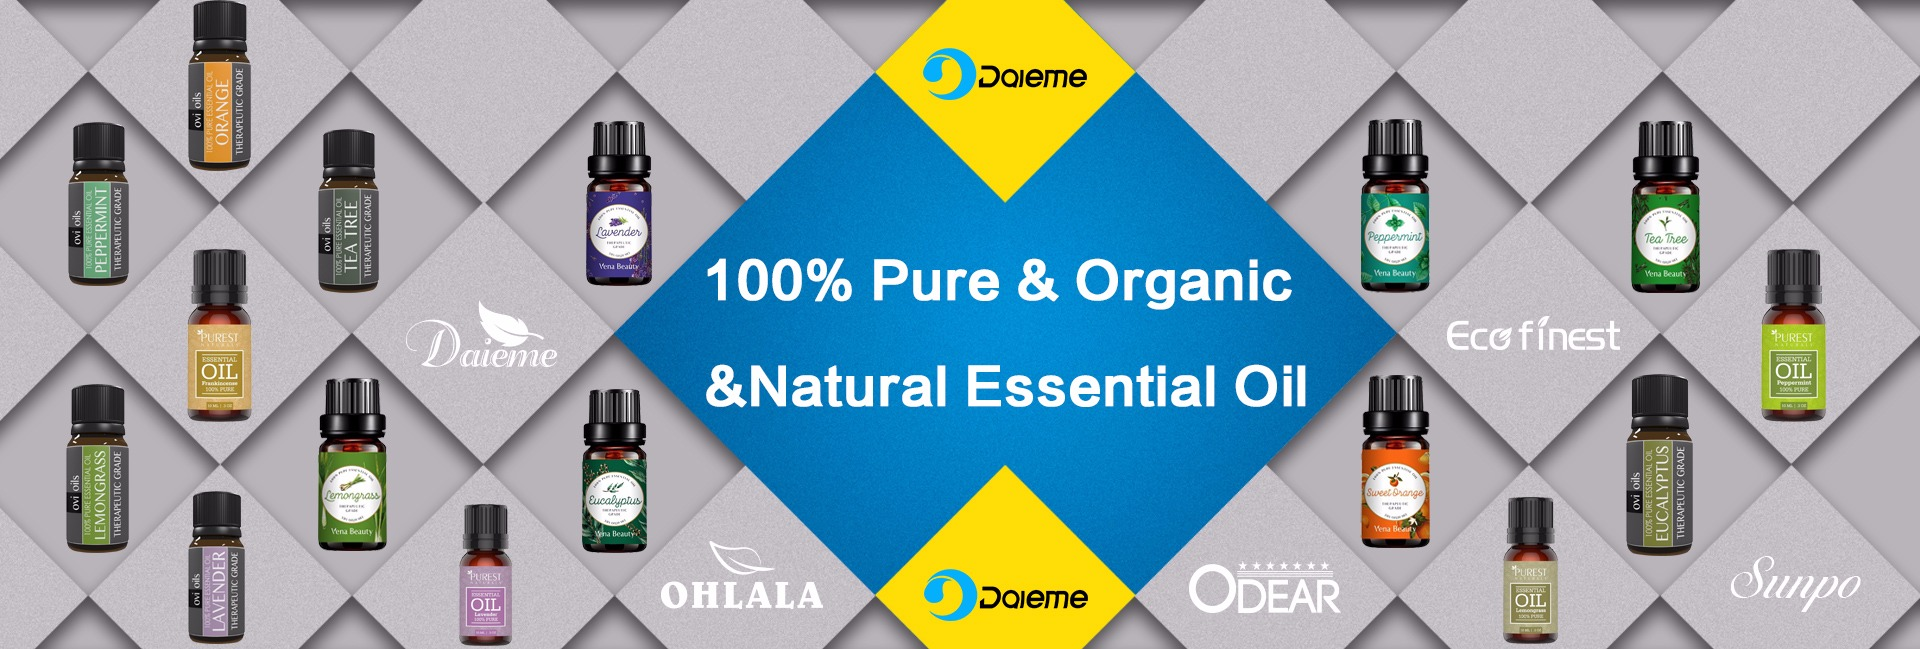 Guangzhou Daieme Cosmetic Co Ltd Skin Care Personal Beauty Rosemary Essential Oil 10ml Minyak 100 Murni Chat Online